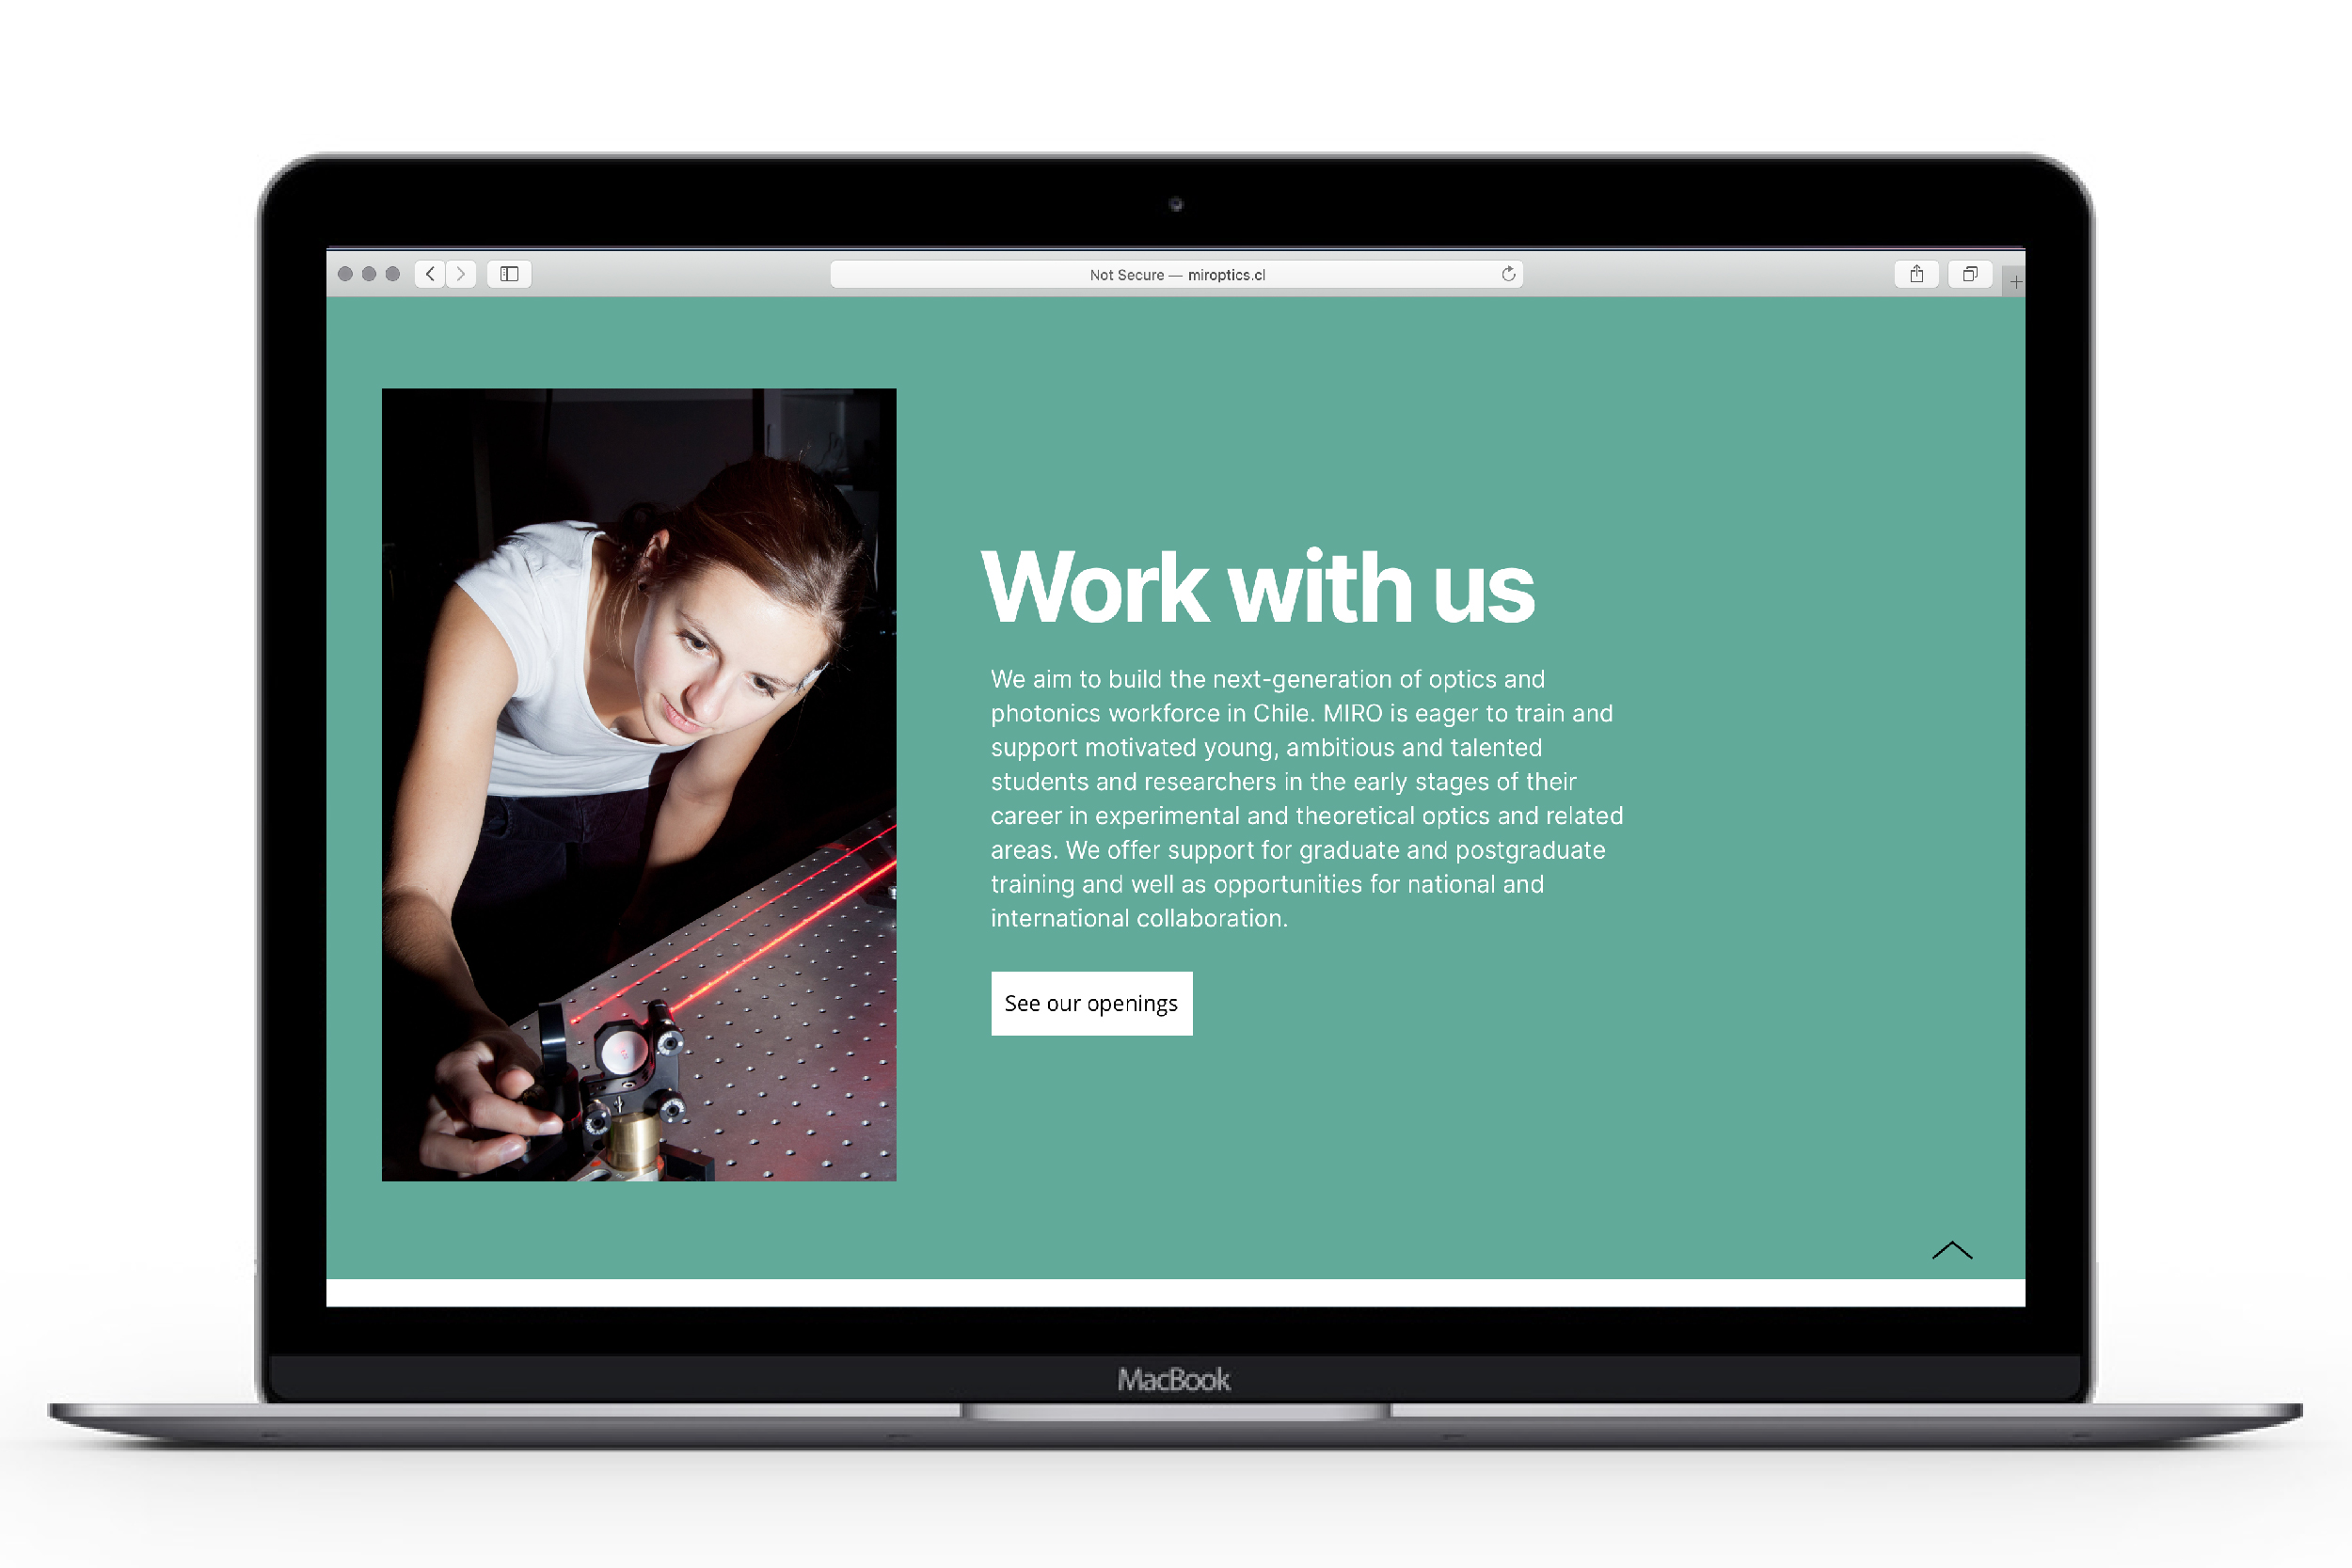 Bitflow-studio-miro-web-design-research-institute-3